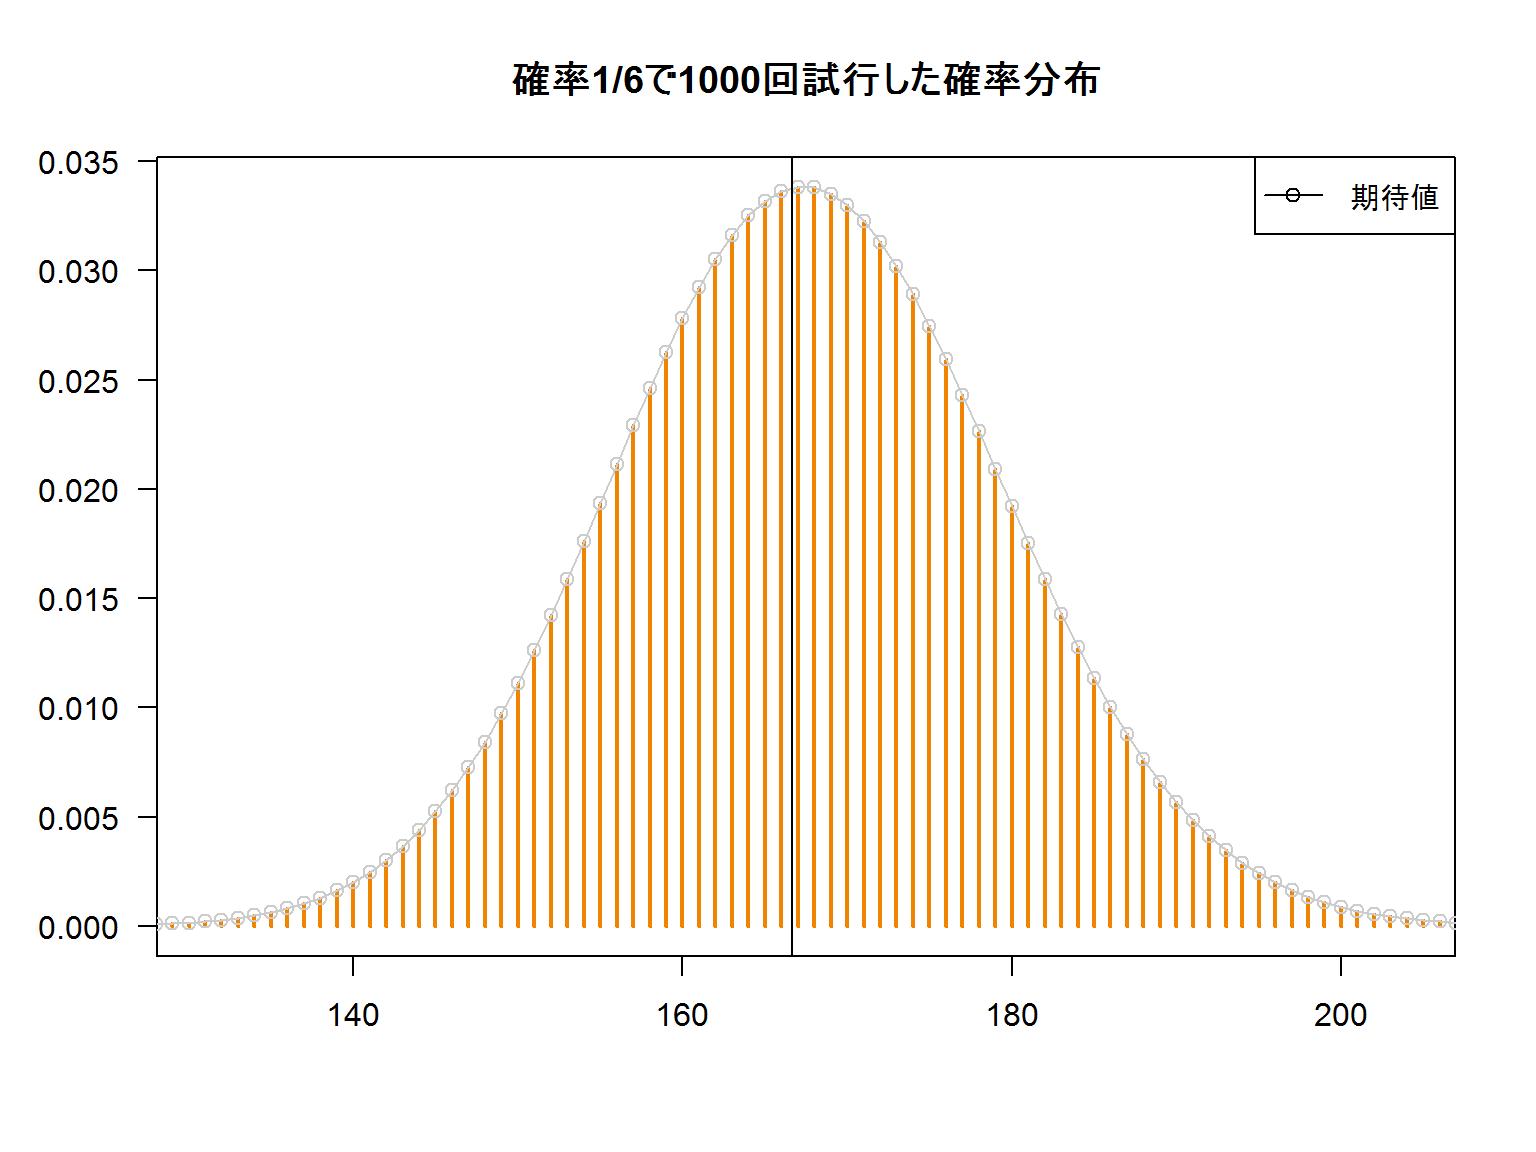 Poisson_distribution_1